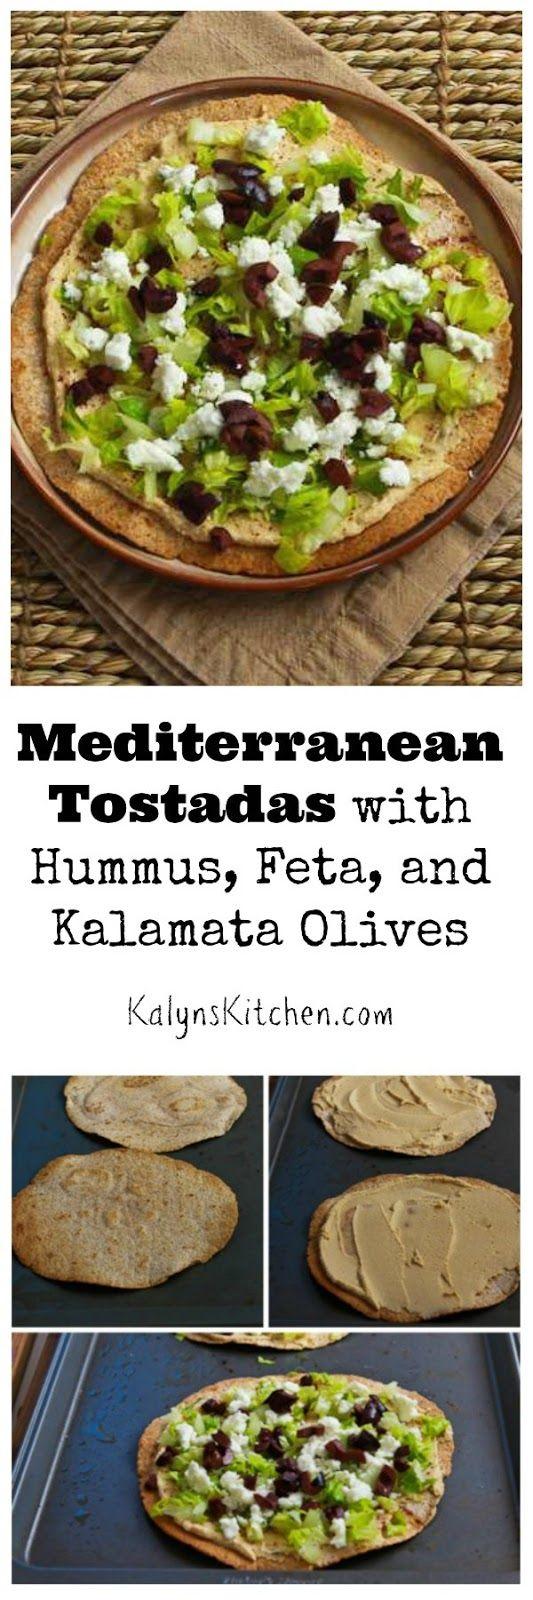 These Mediterranean Tostadas with Hummus, Feta, and Kalamata Olives ...